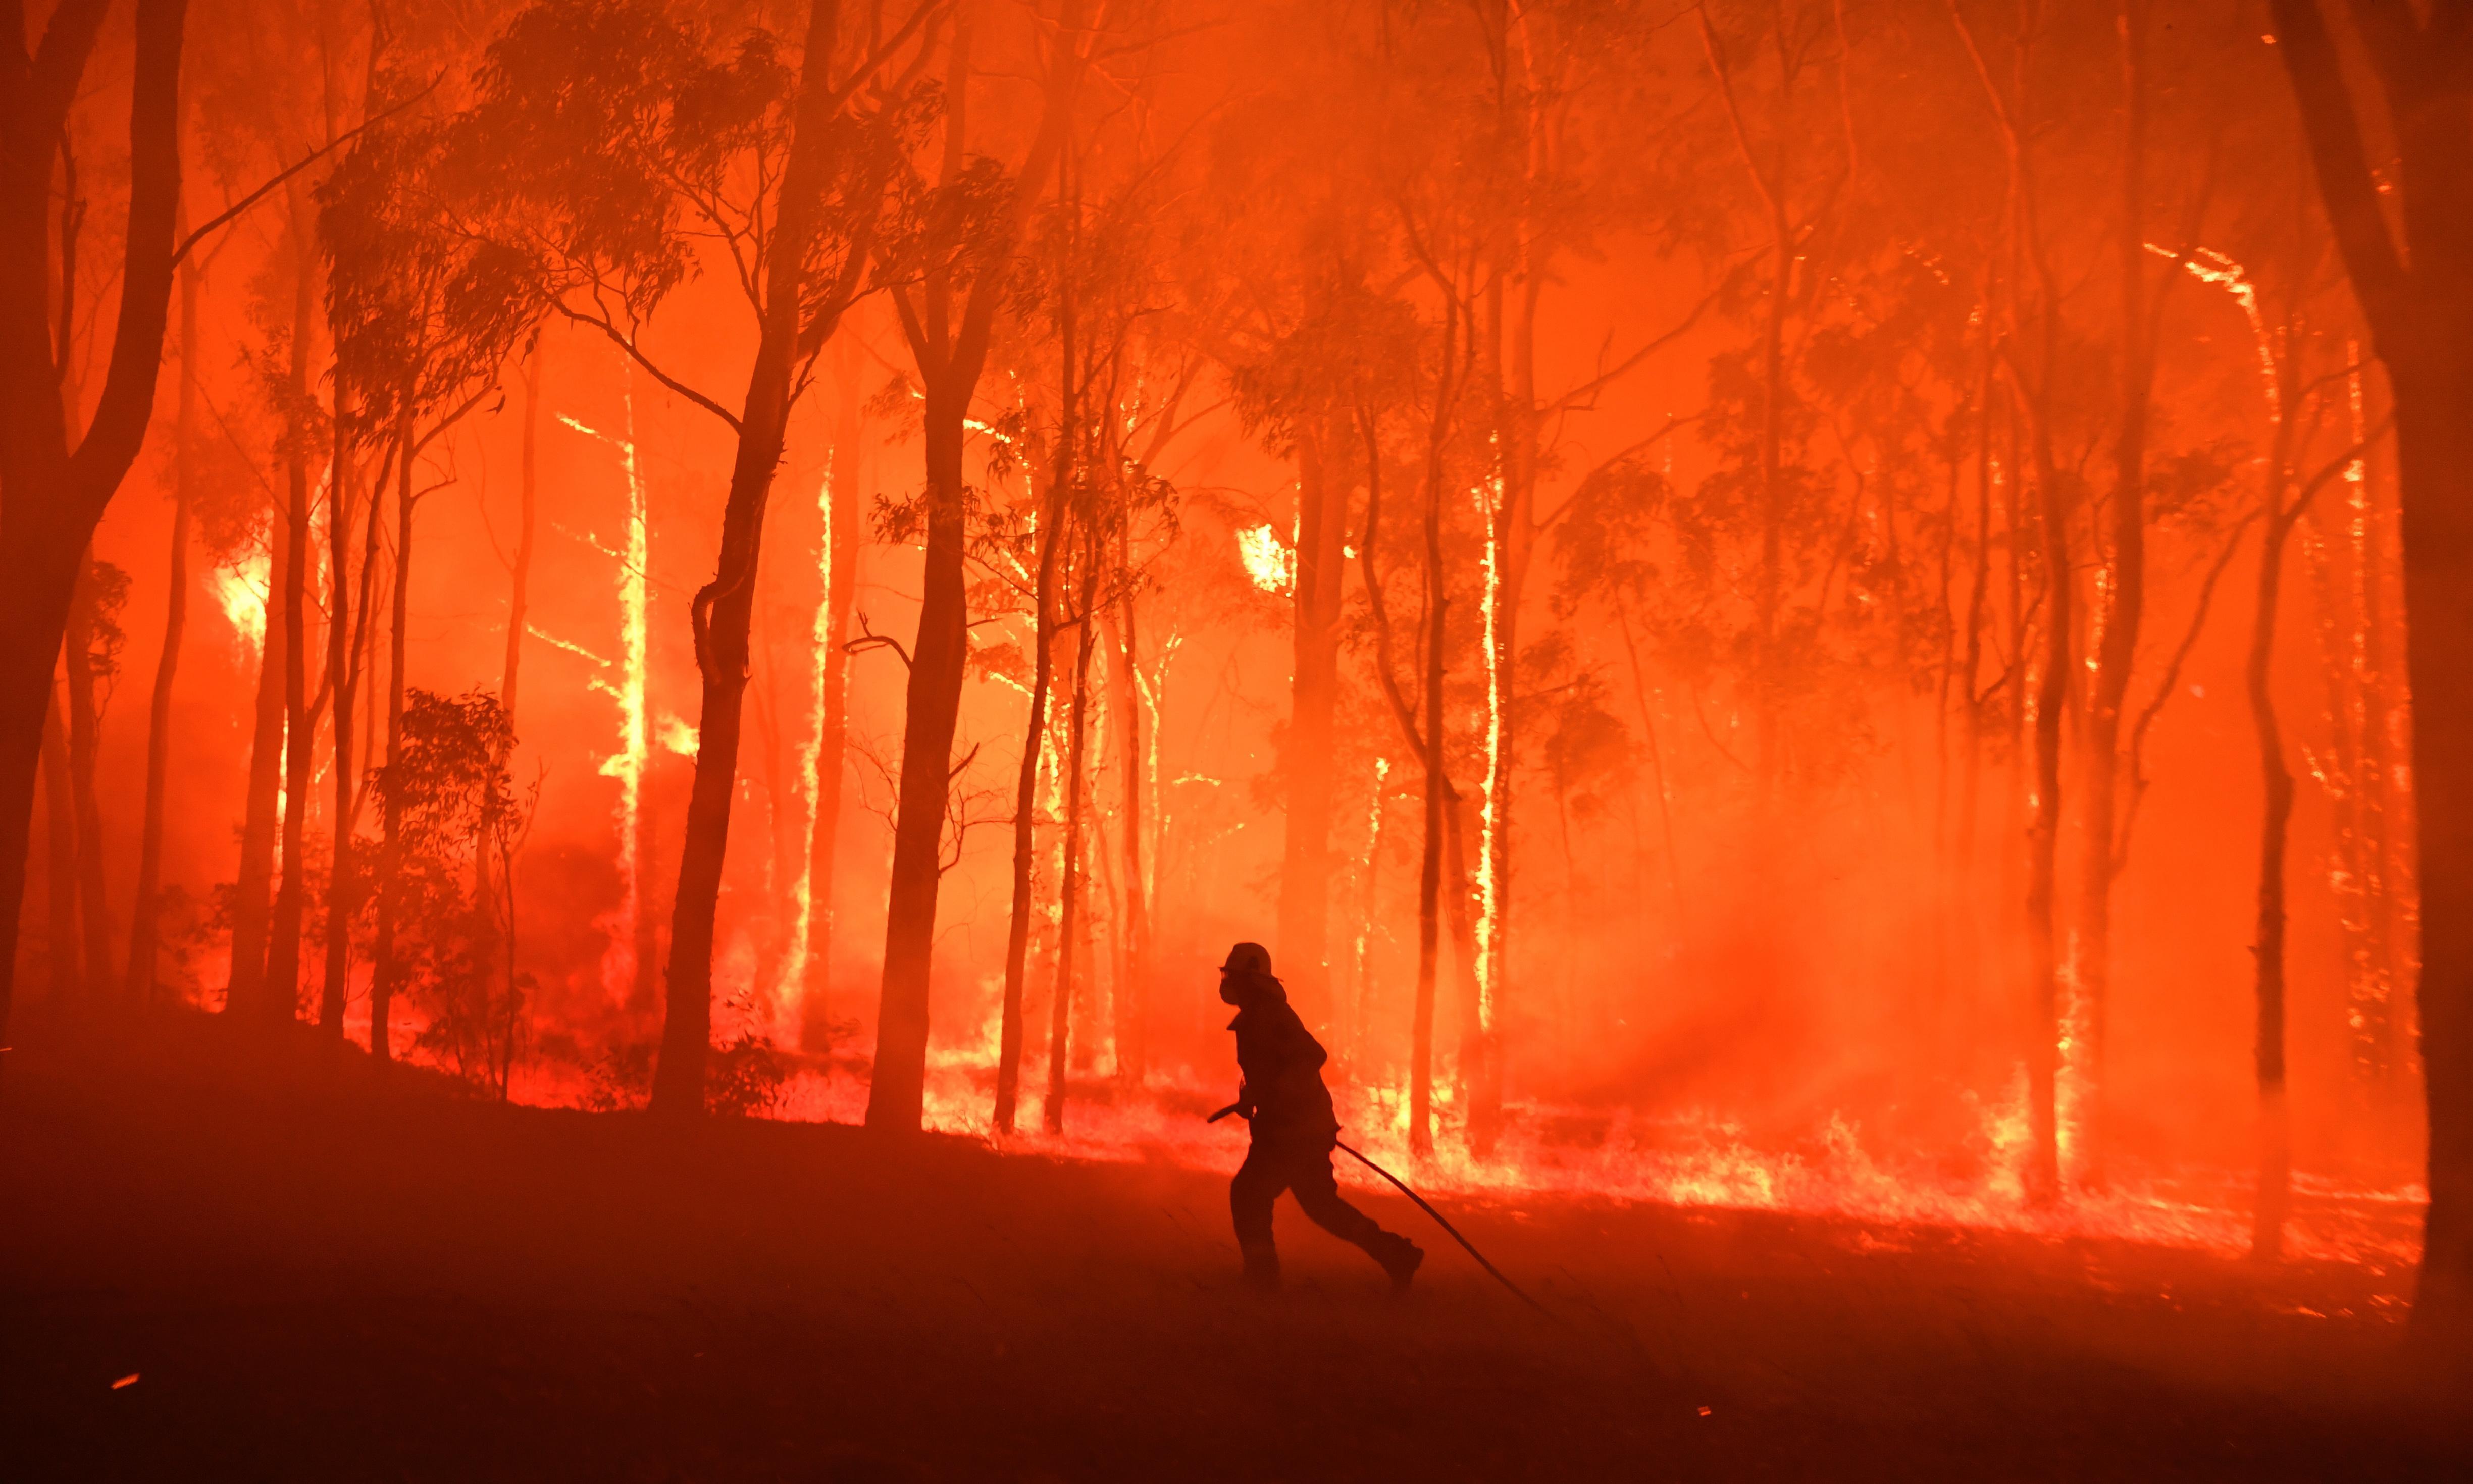 Australia bushfires factcheck: are this year's fires unprecedented?